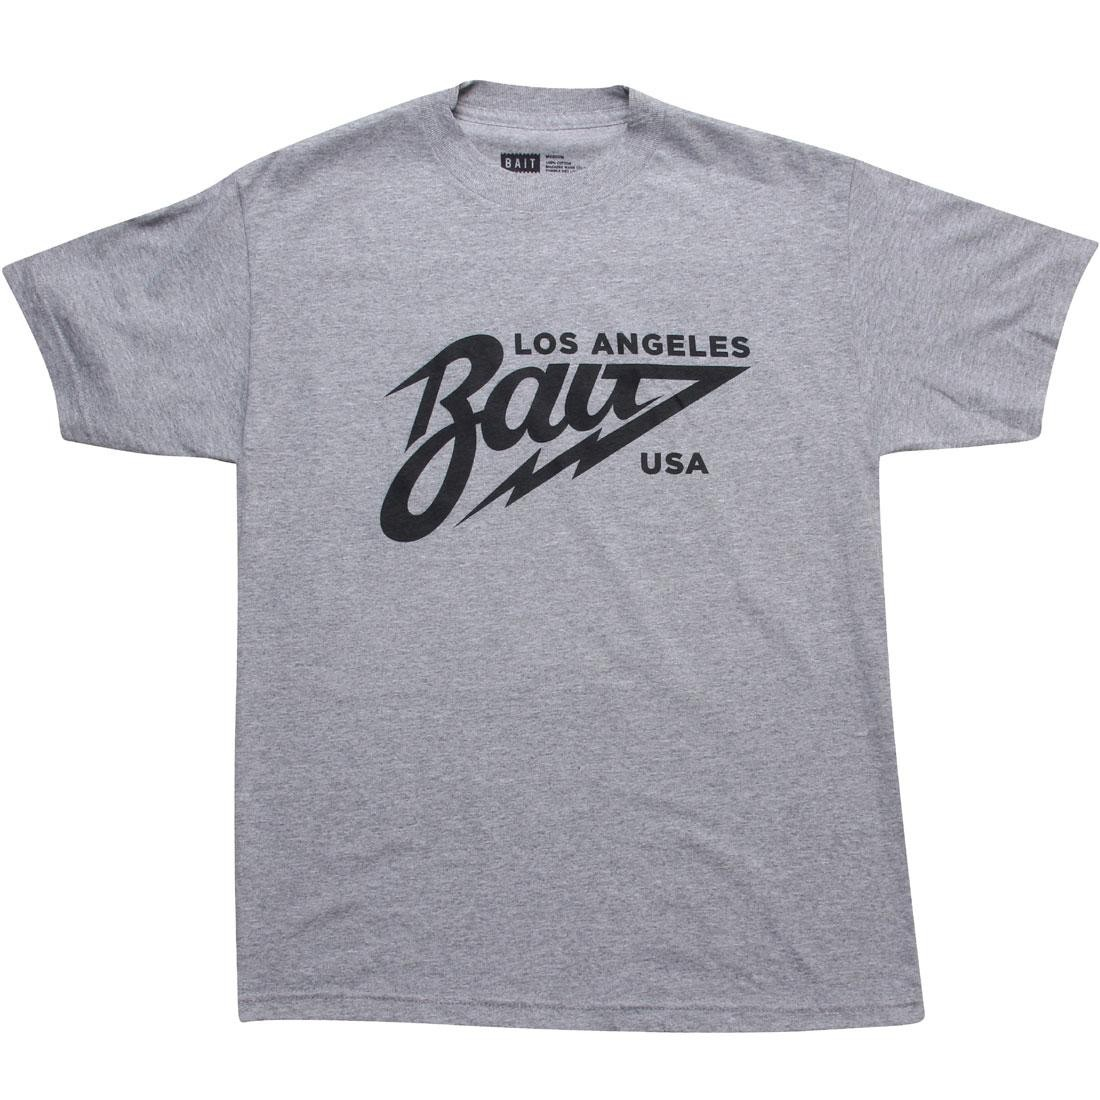 BAIT Los Angeles Tee (heather grey / black)